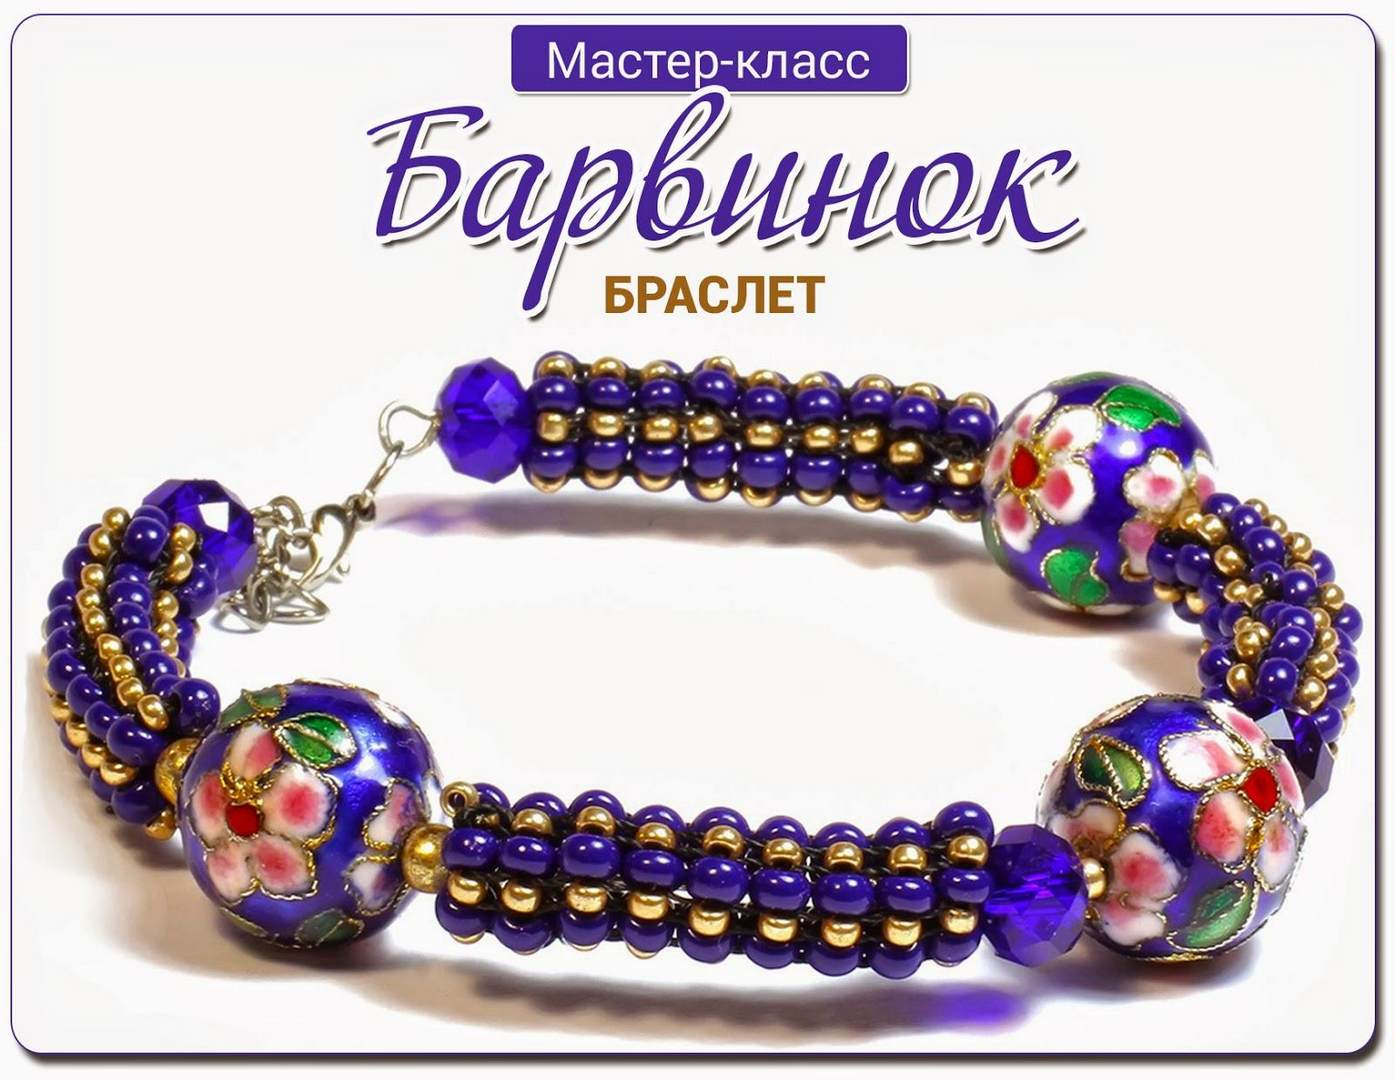 "Мастер-класс ""Барвинок""  Жгут бисер и бусины в необычном плетении"